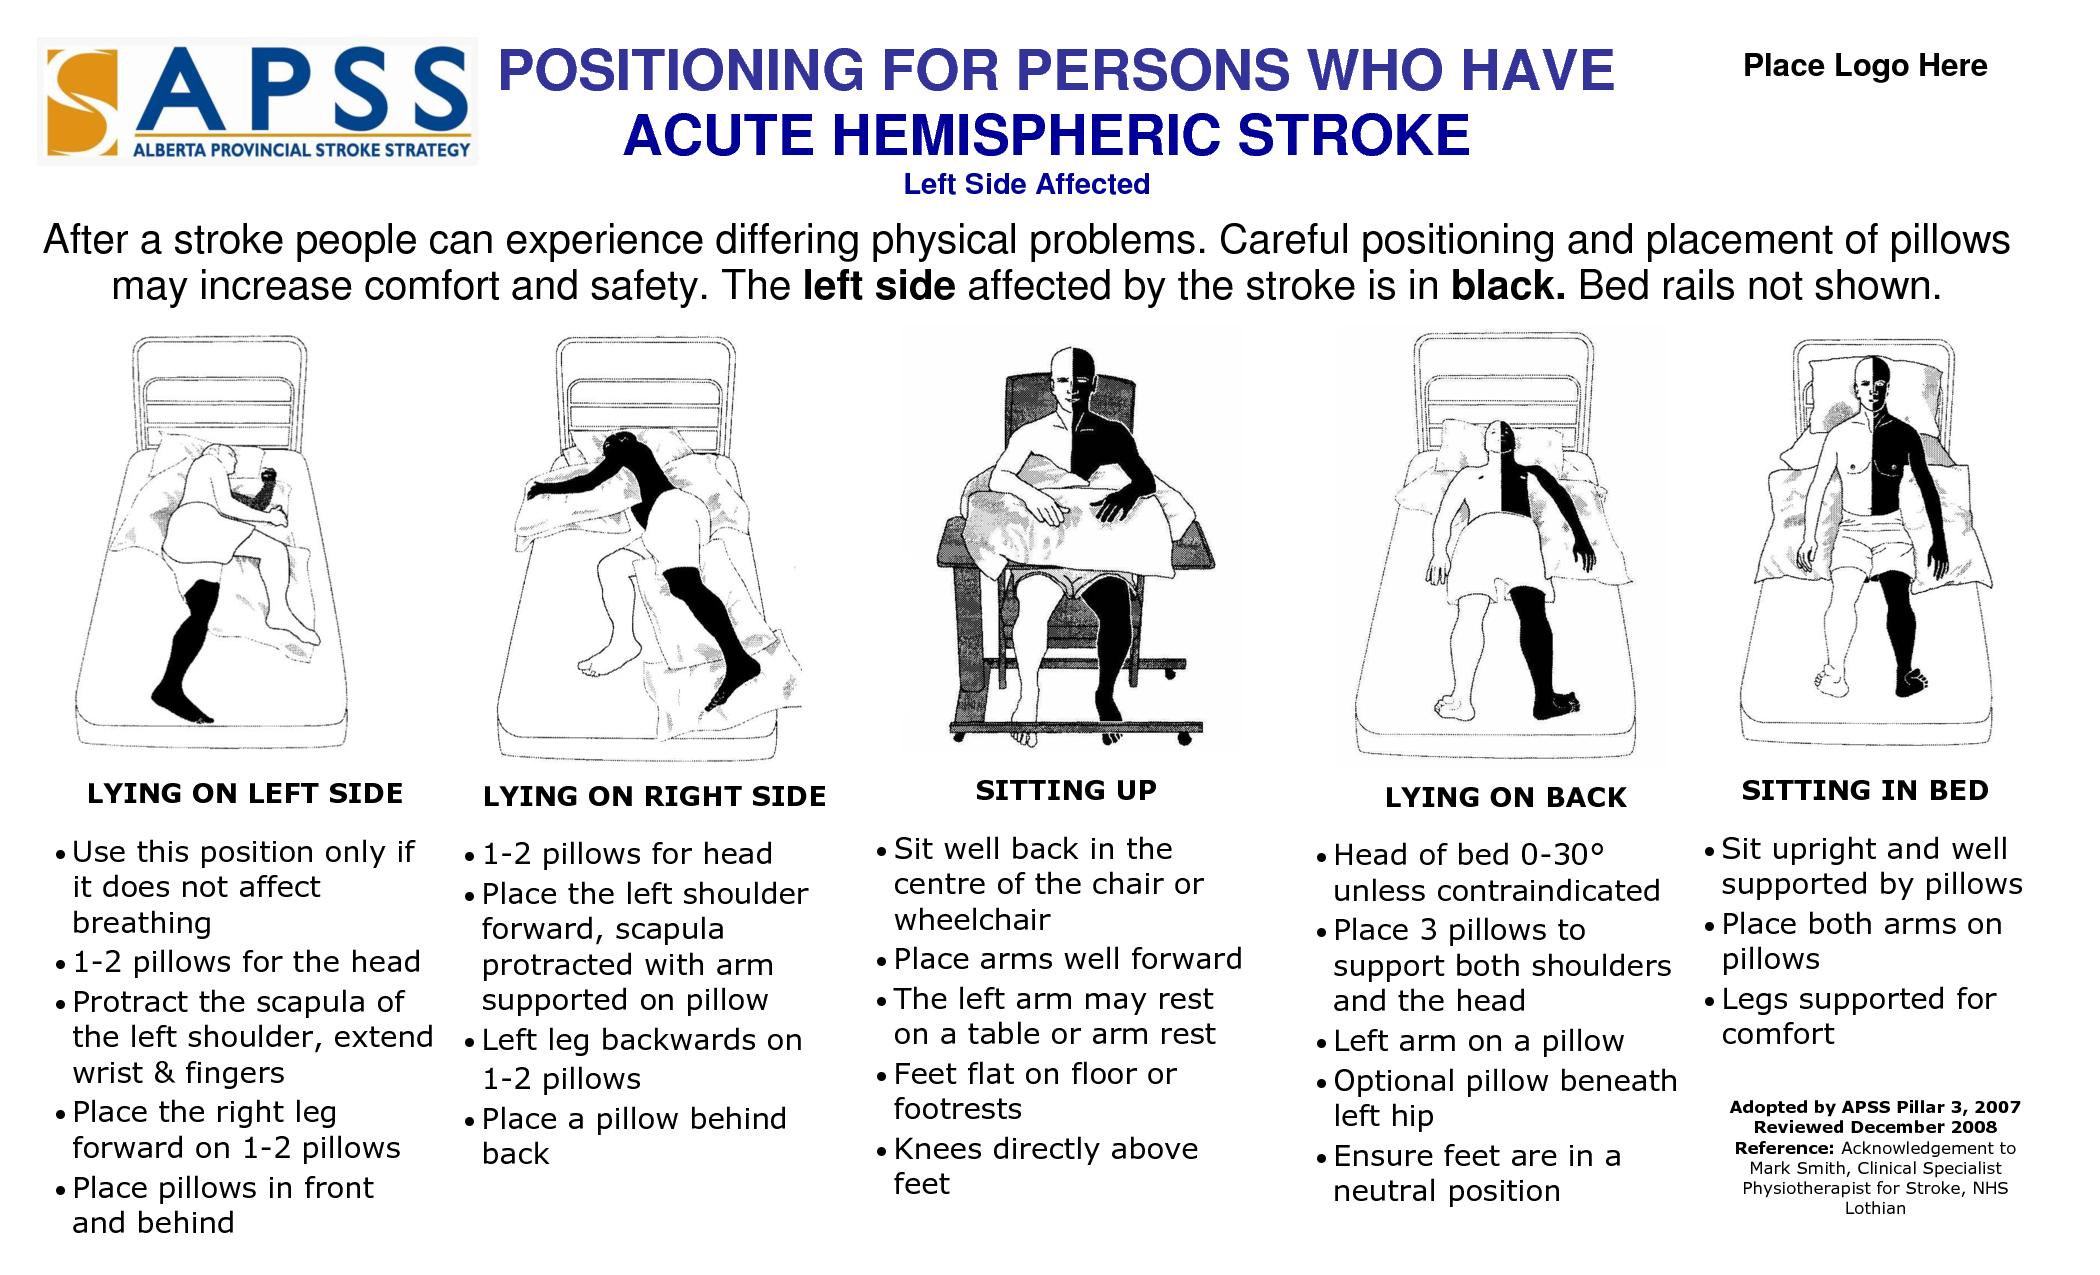 Stroke Patient Positioning Poster Eft Side Affects Ot